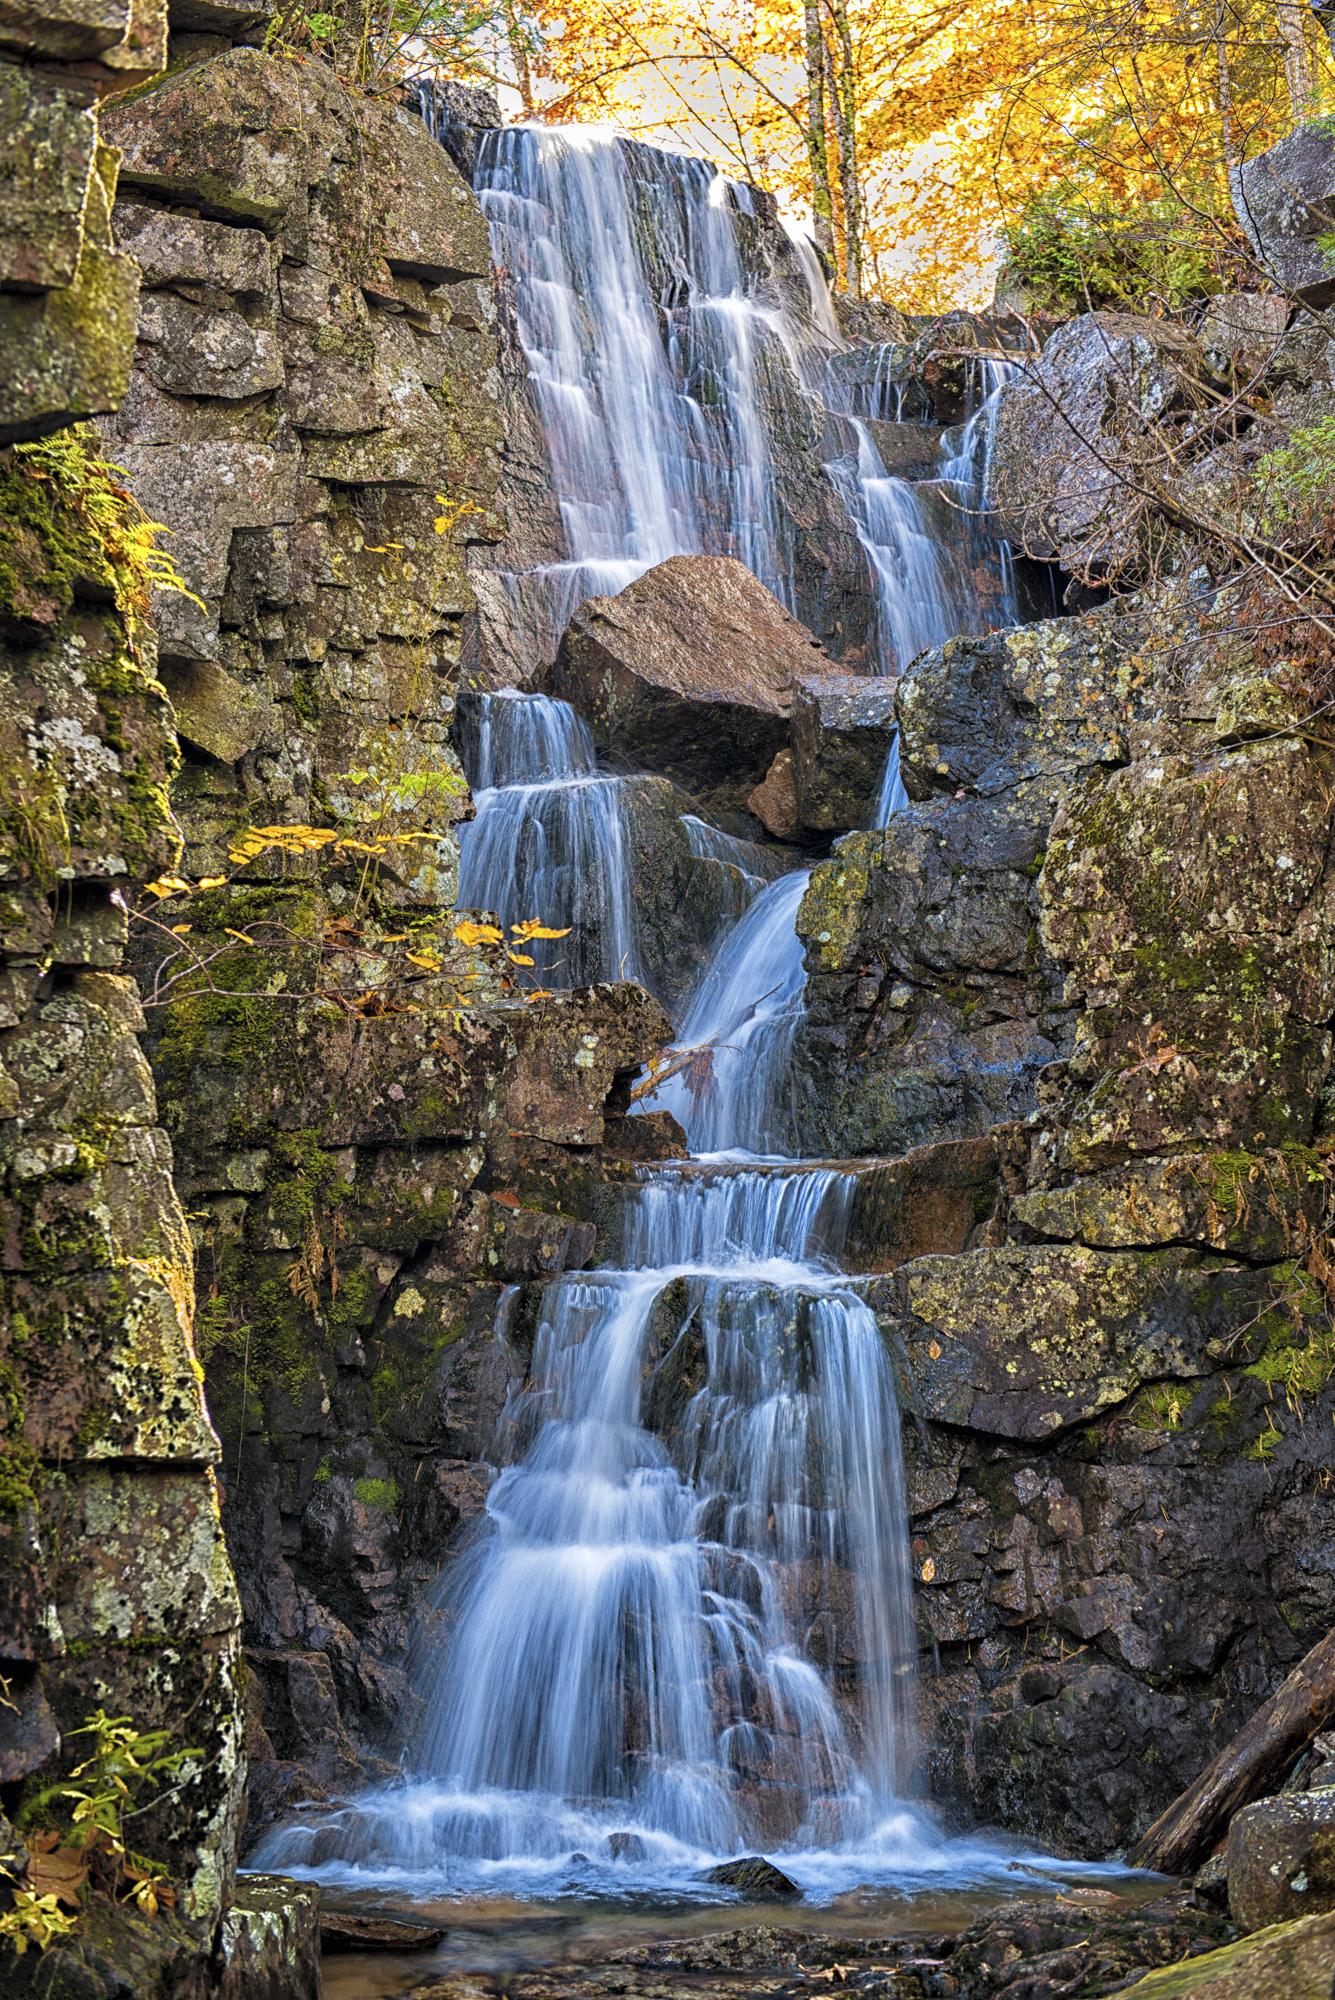 Chasm Brook Waterfalls, Acadia National Park, Maine